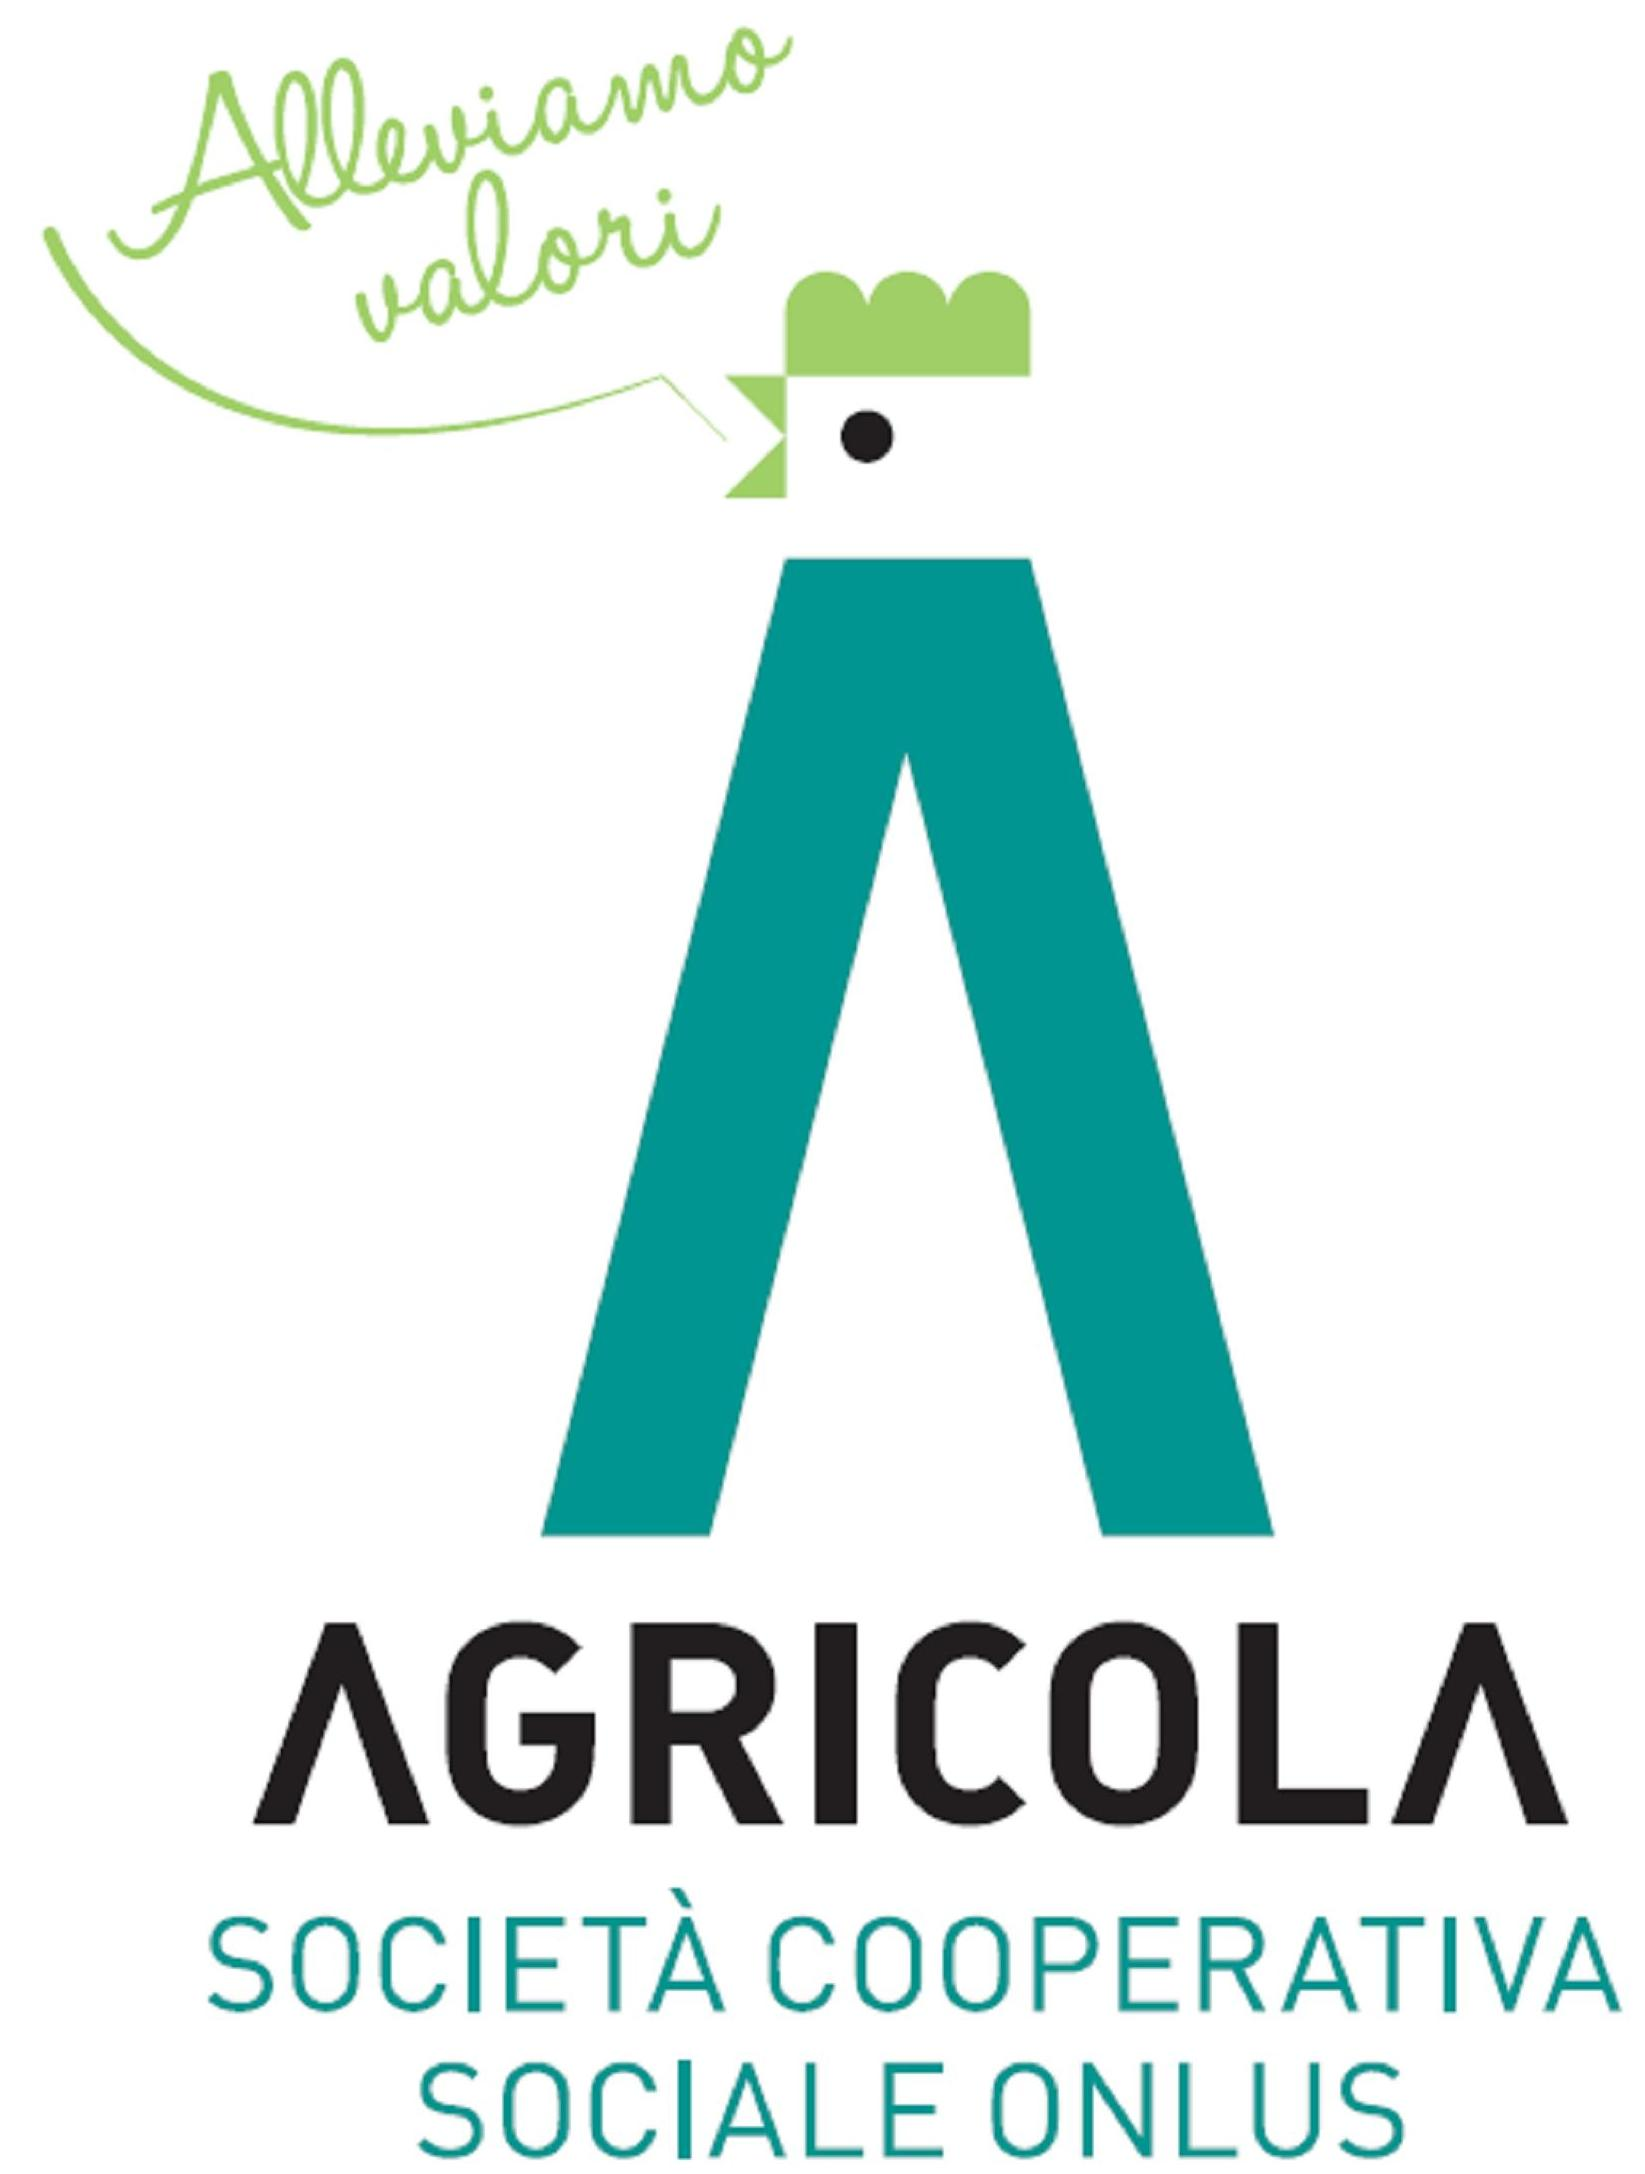 AGRICOLA – SOCIETÀ COOPERATIVA SOCIALE ONLUS